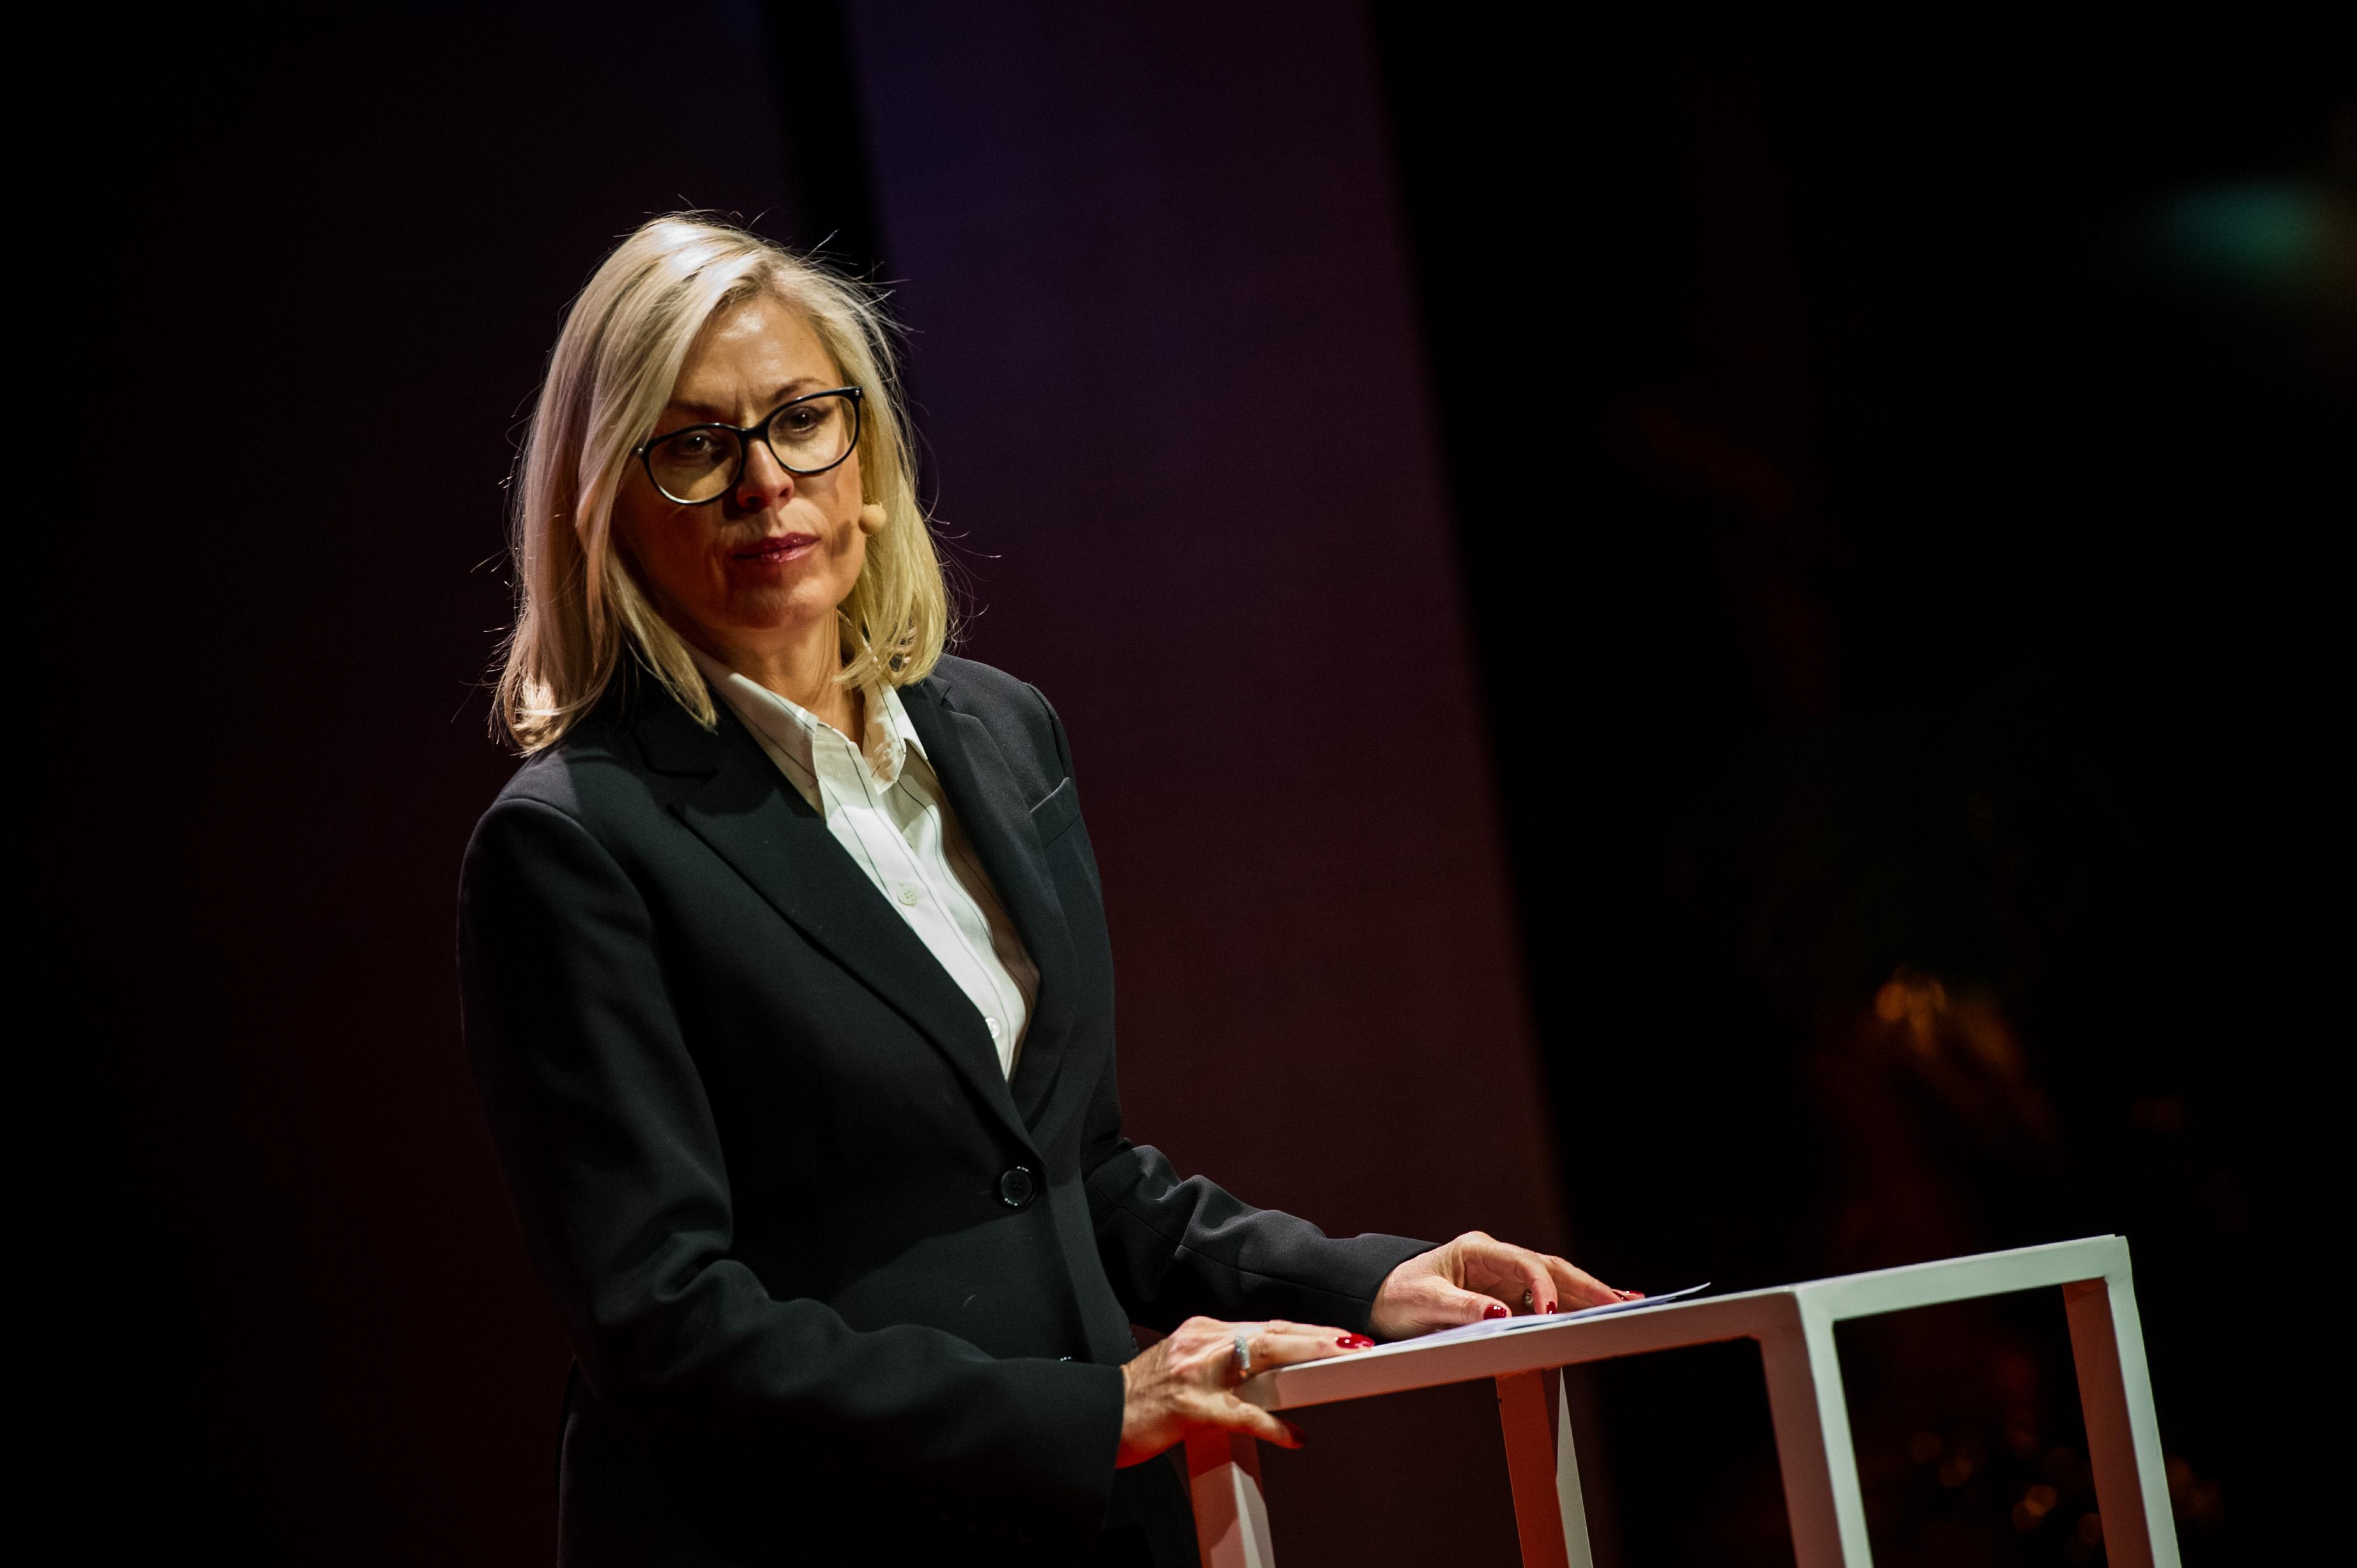 Chantal Gaemperle